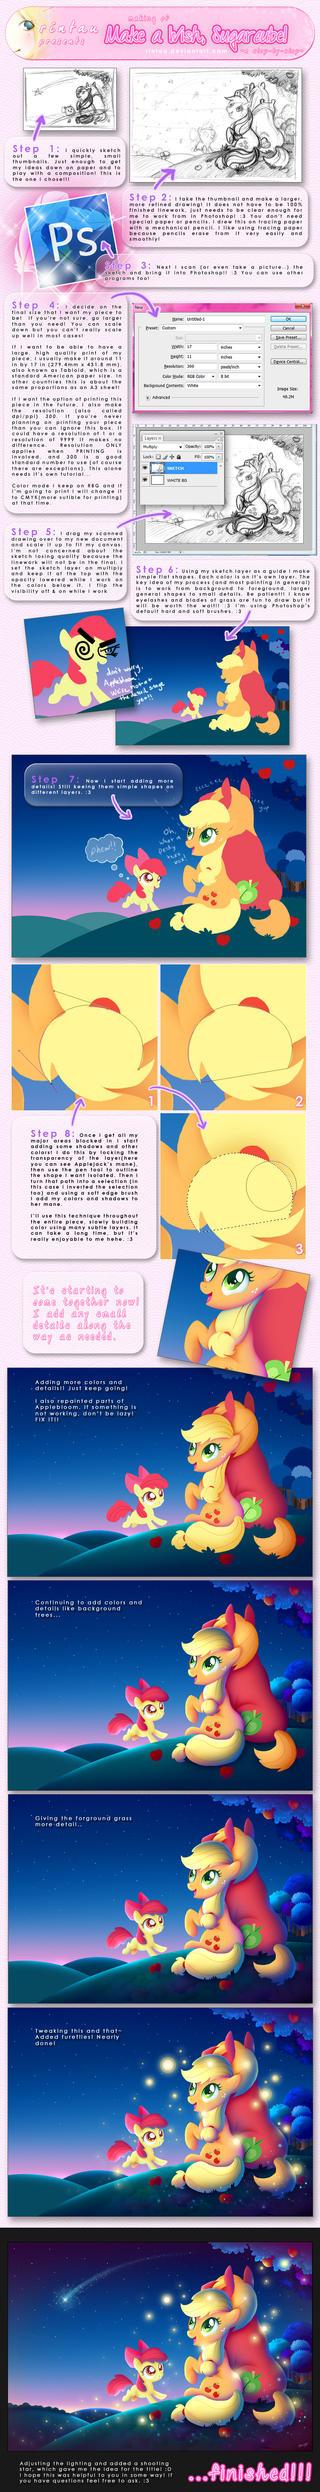 Making of : Make a Wish, Sugarcube! by RinTau